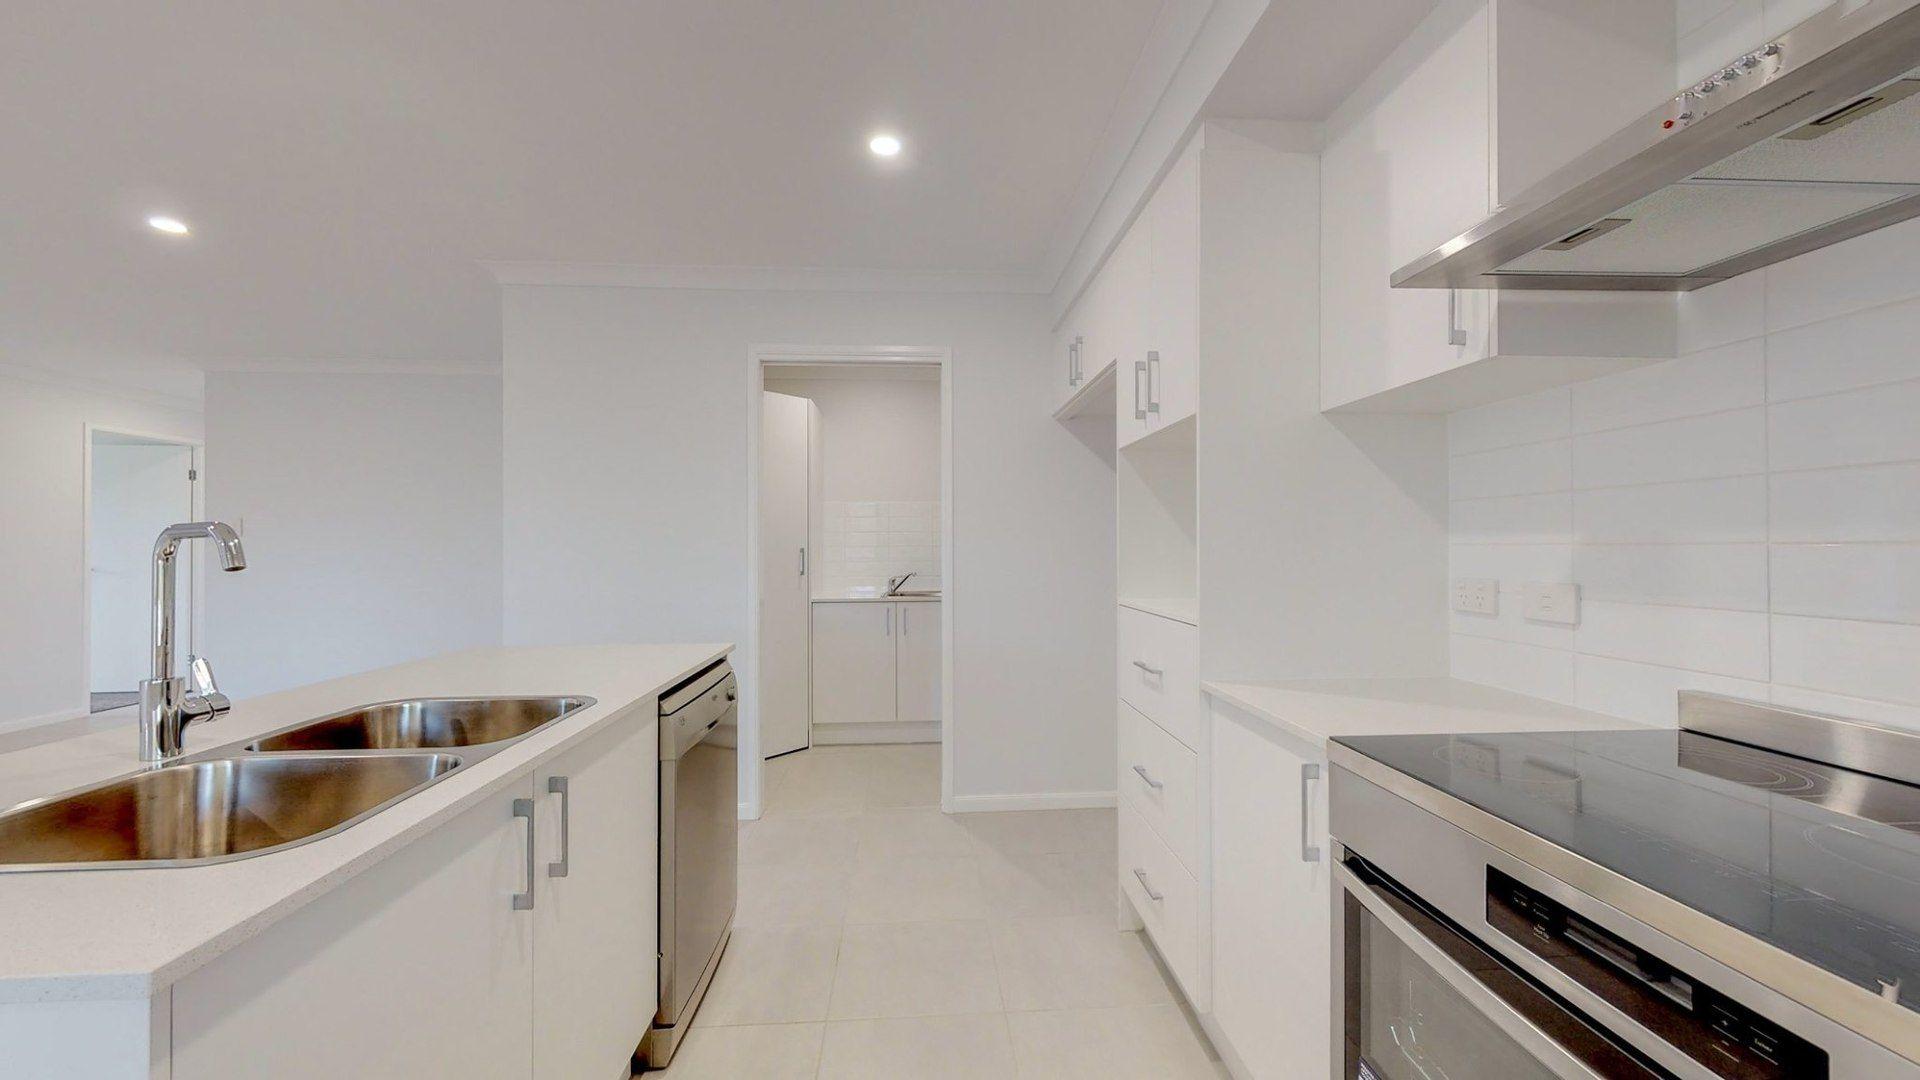 Lot 19 Cambooya Ridge Estate, Cambooya QLD 4358, Image 2